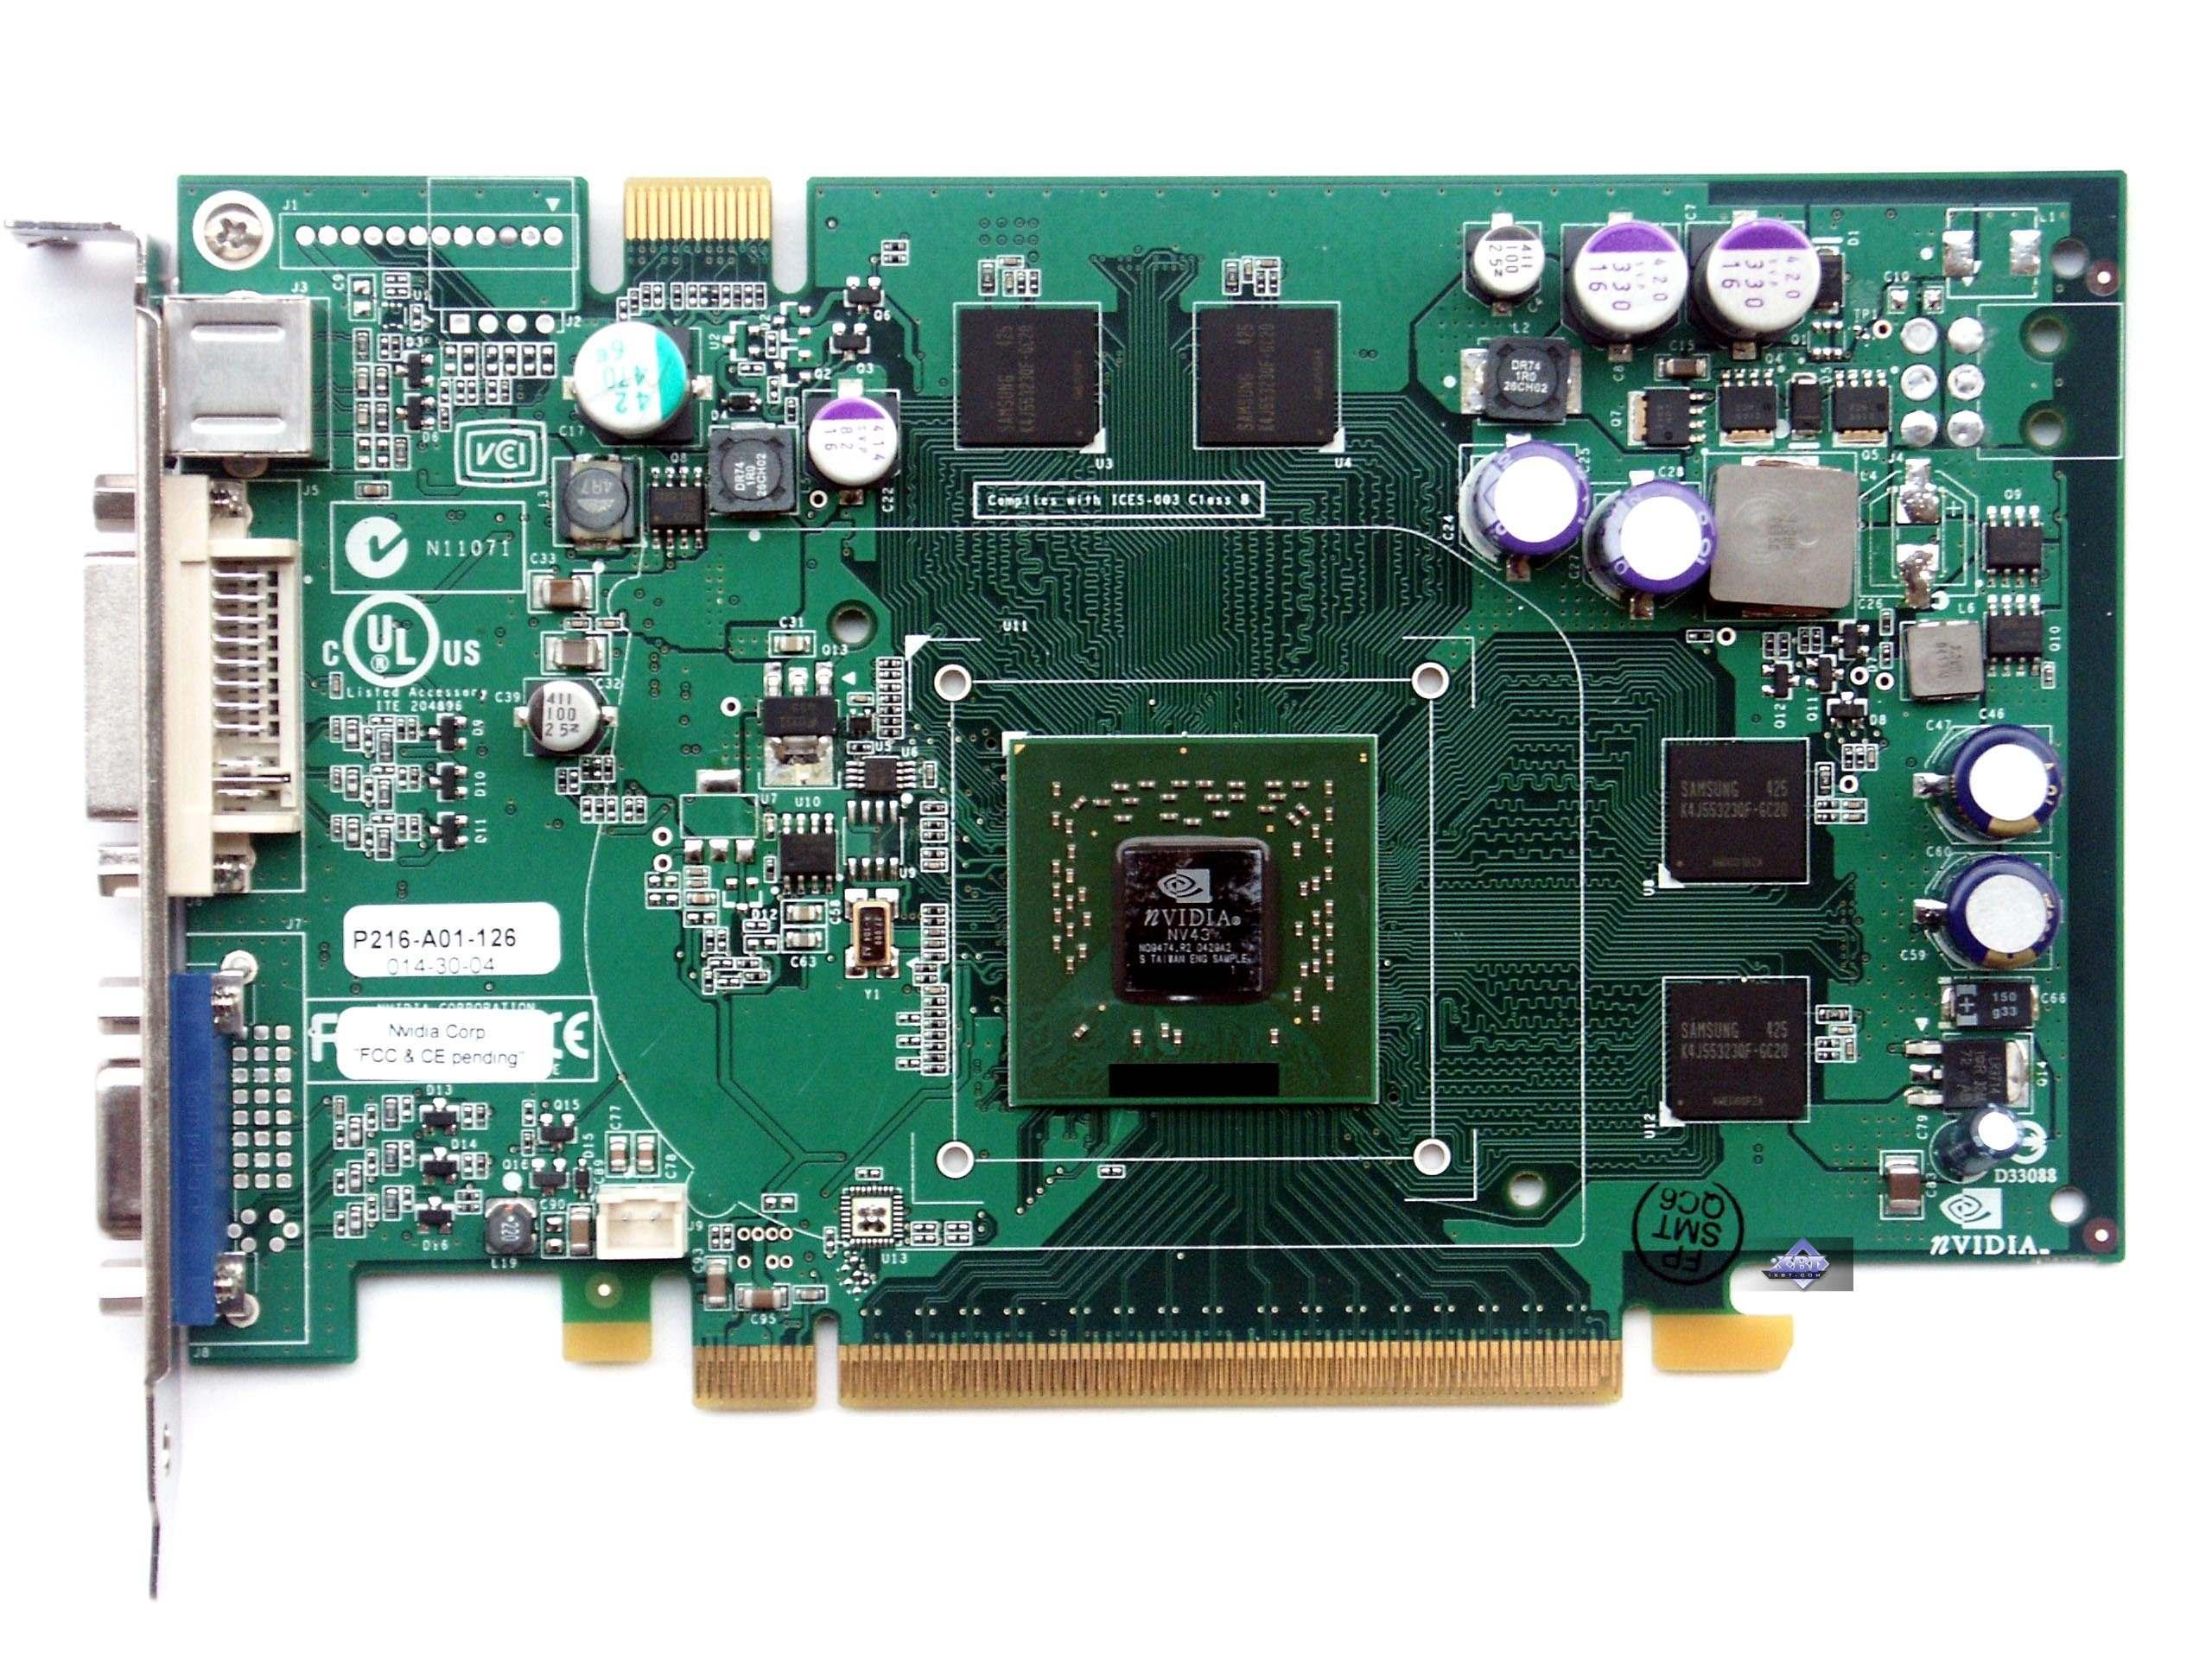 nvidia 6600 драйвер скачать,tcgkfnyj